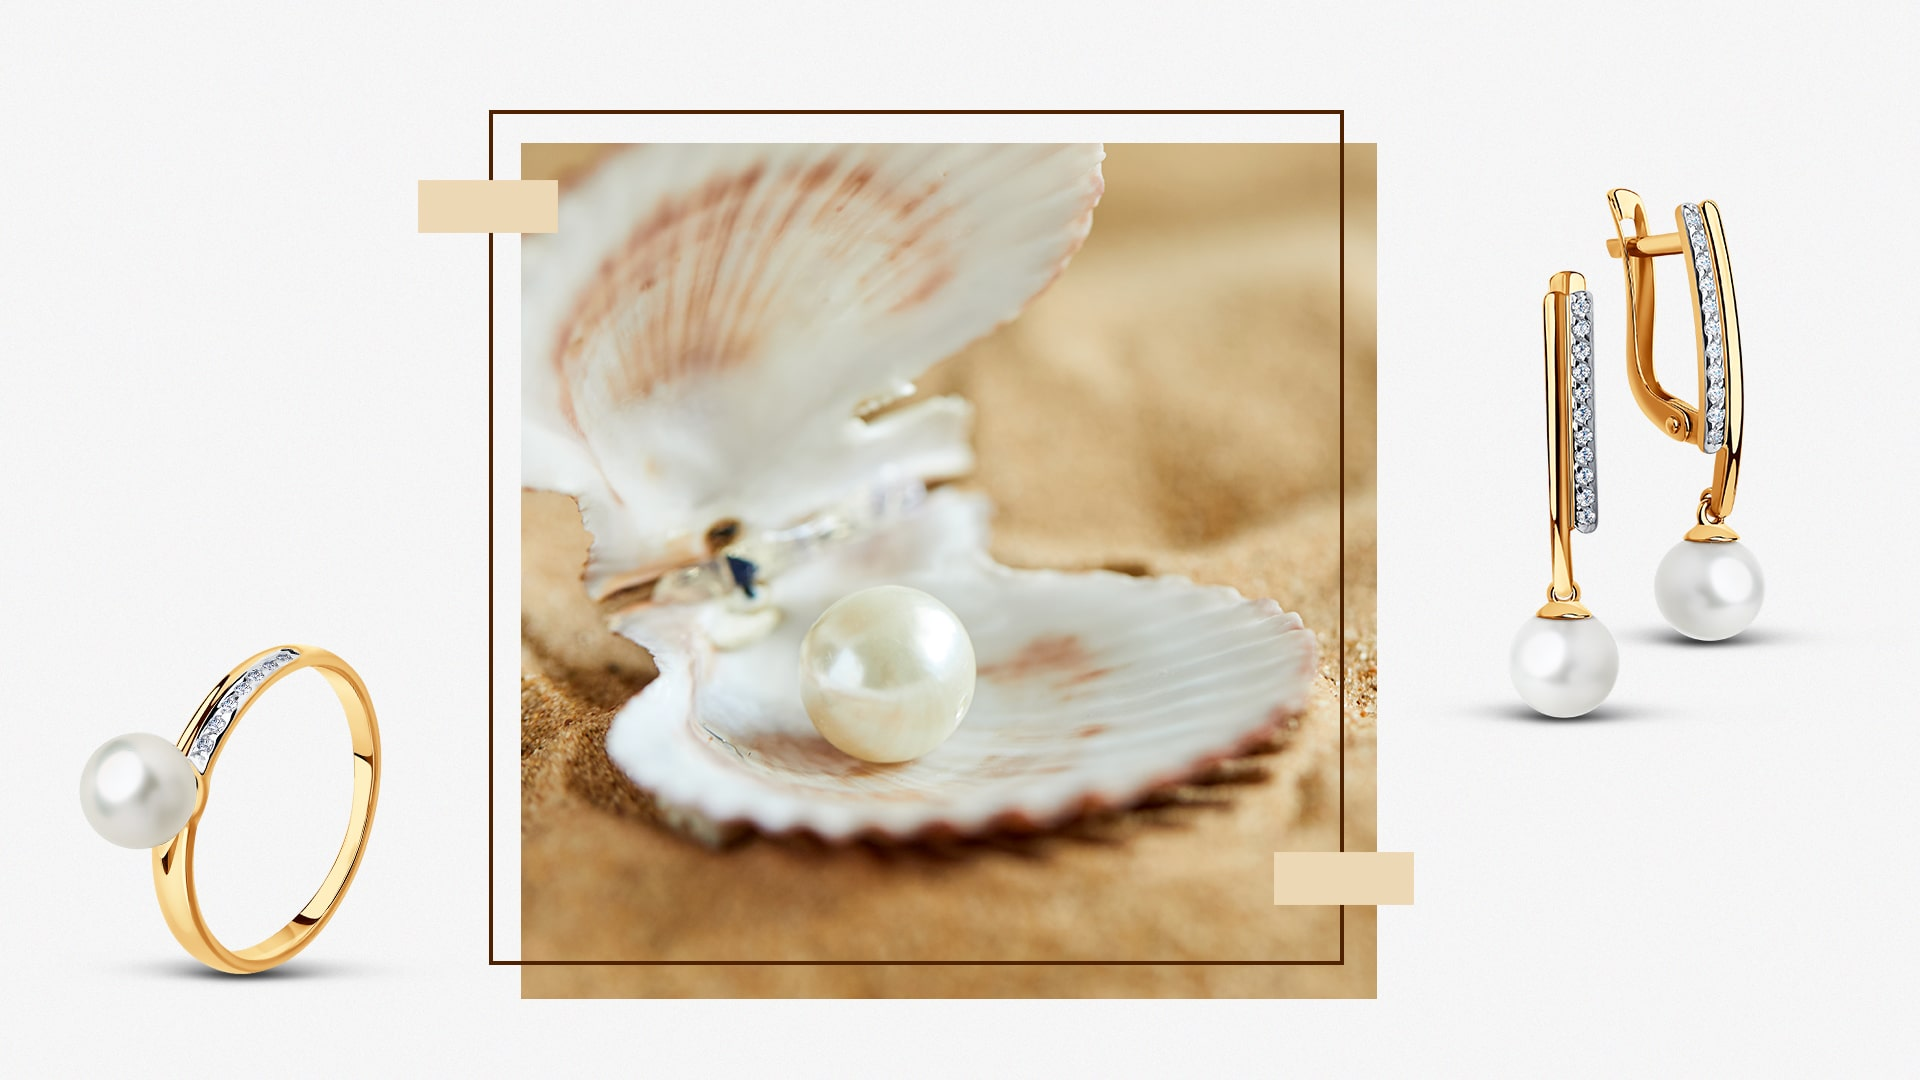 Раковина моллюска